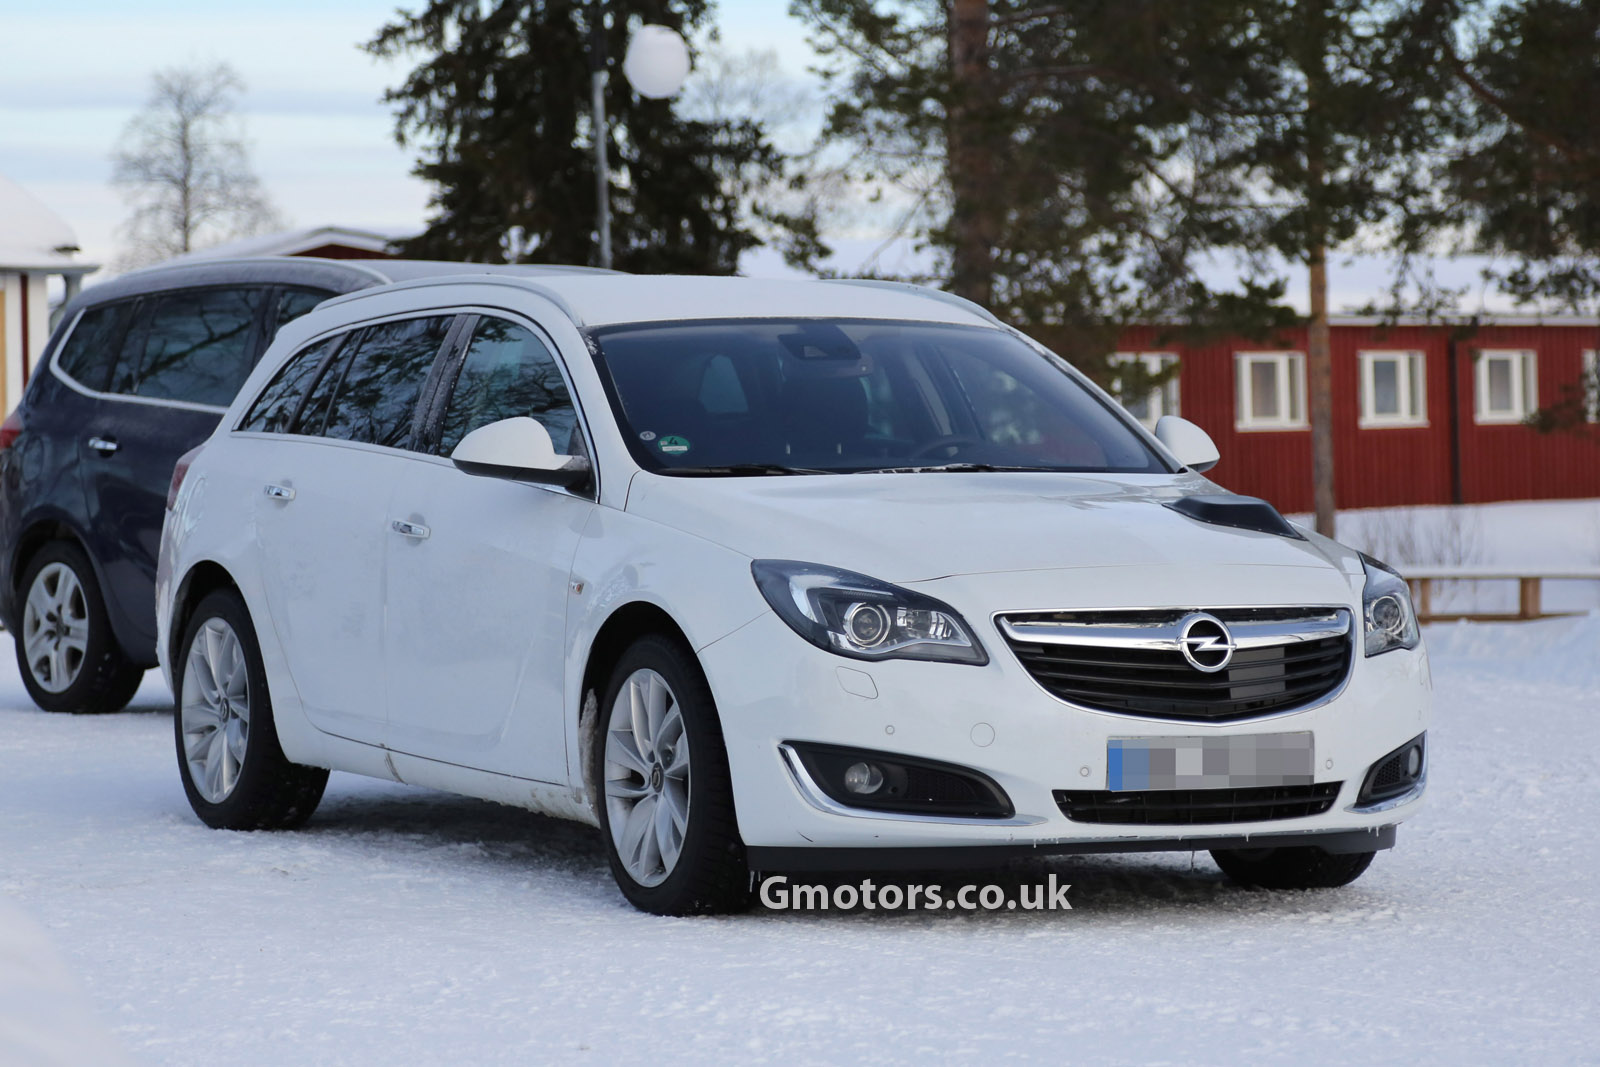 2017 - [Opel] Insignia Grand Sport [E2JO] 2016-Vauxhall-Opel-Insignia-mule-5